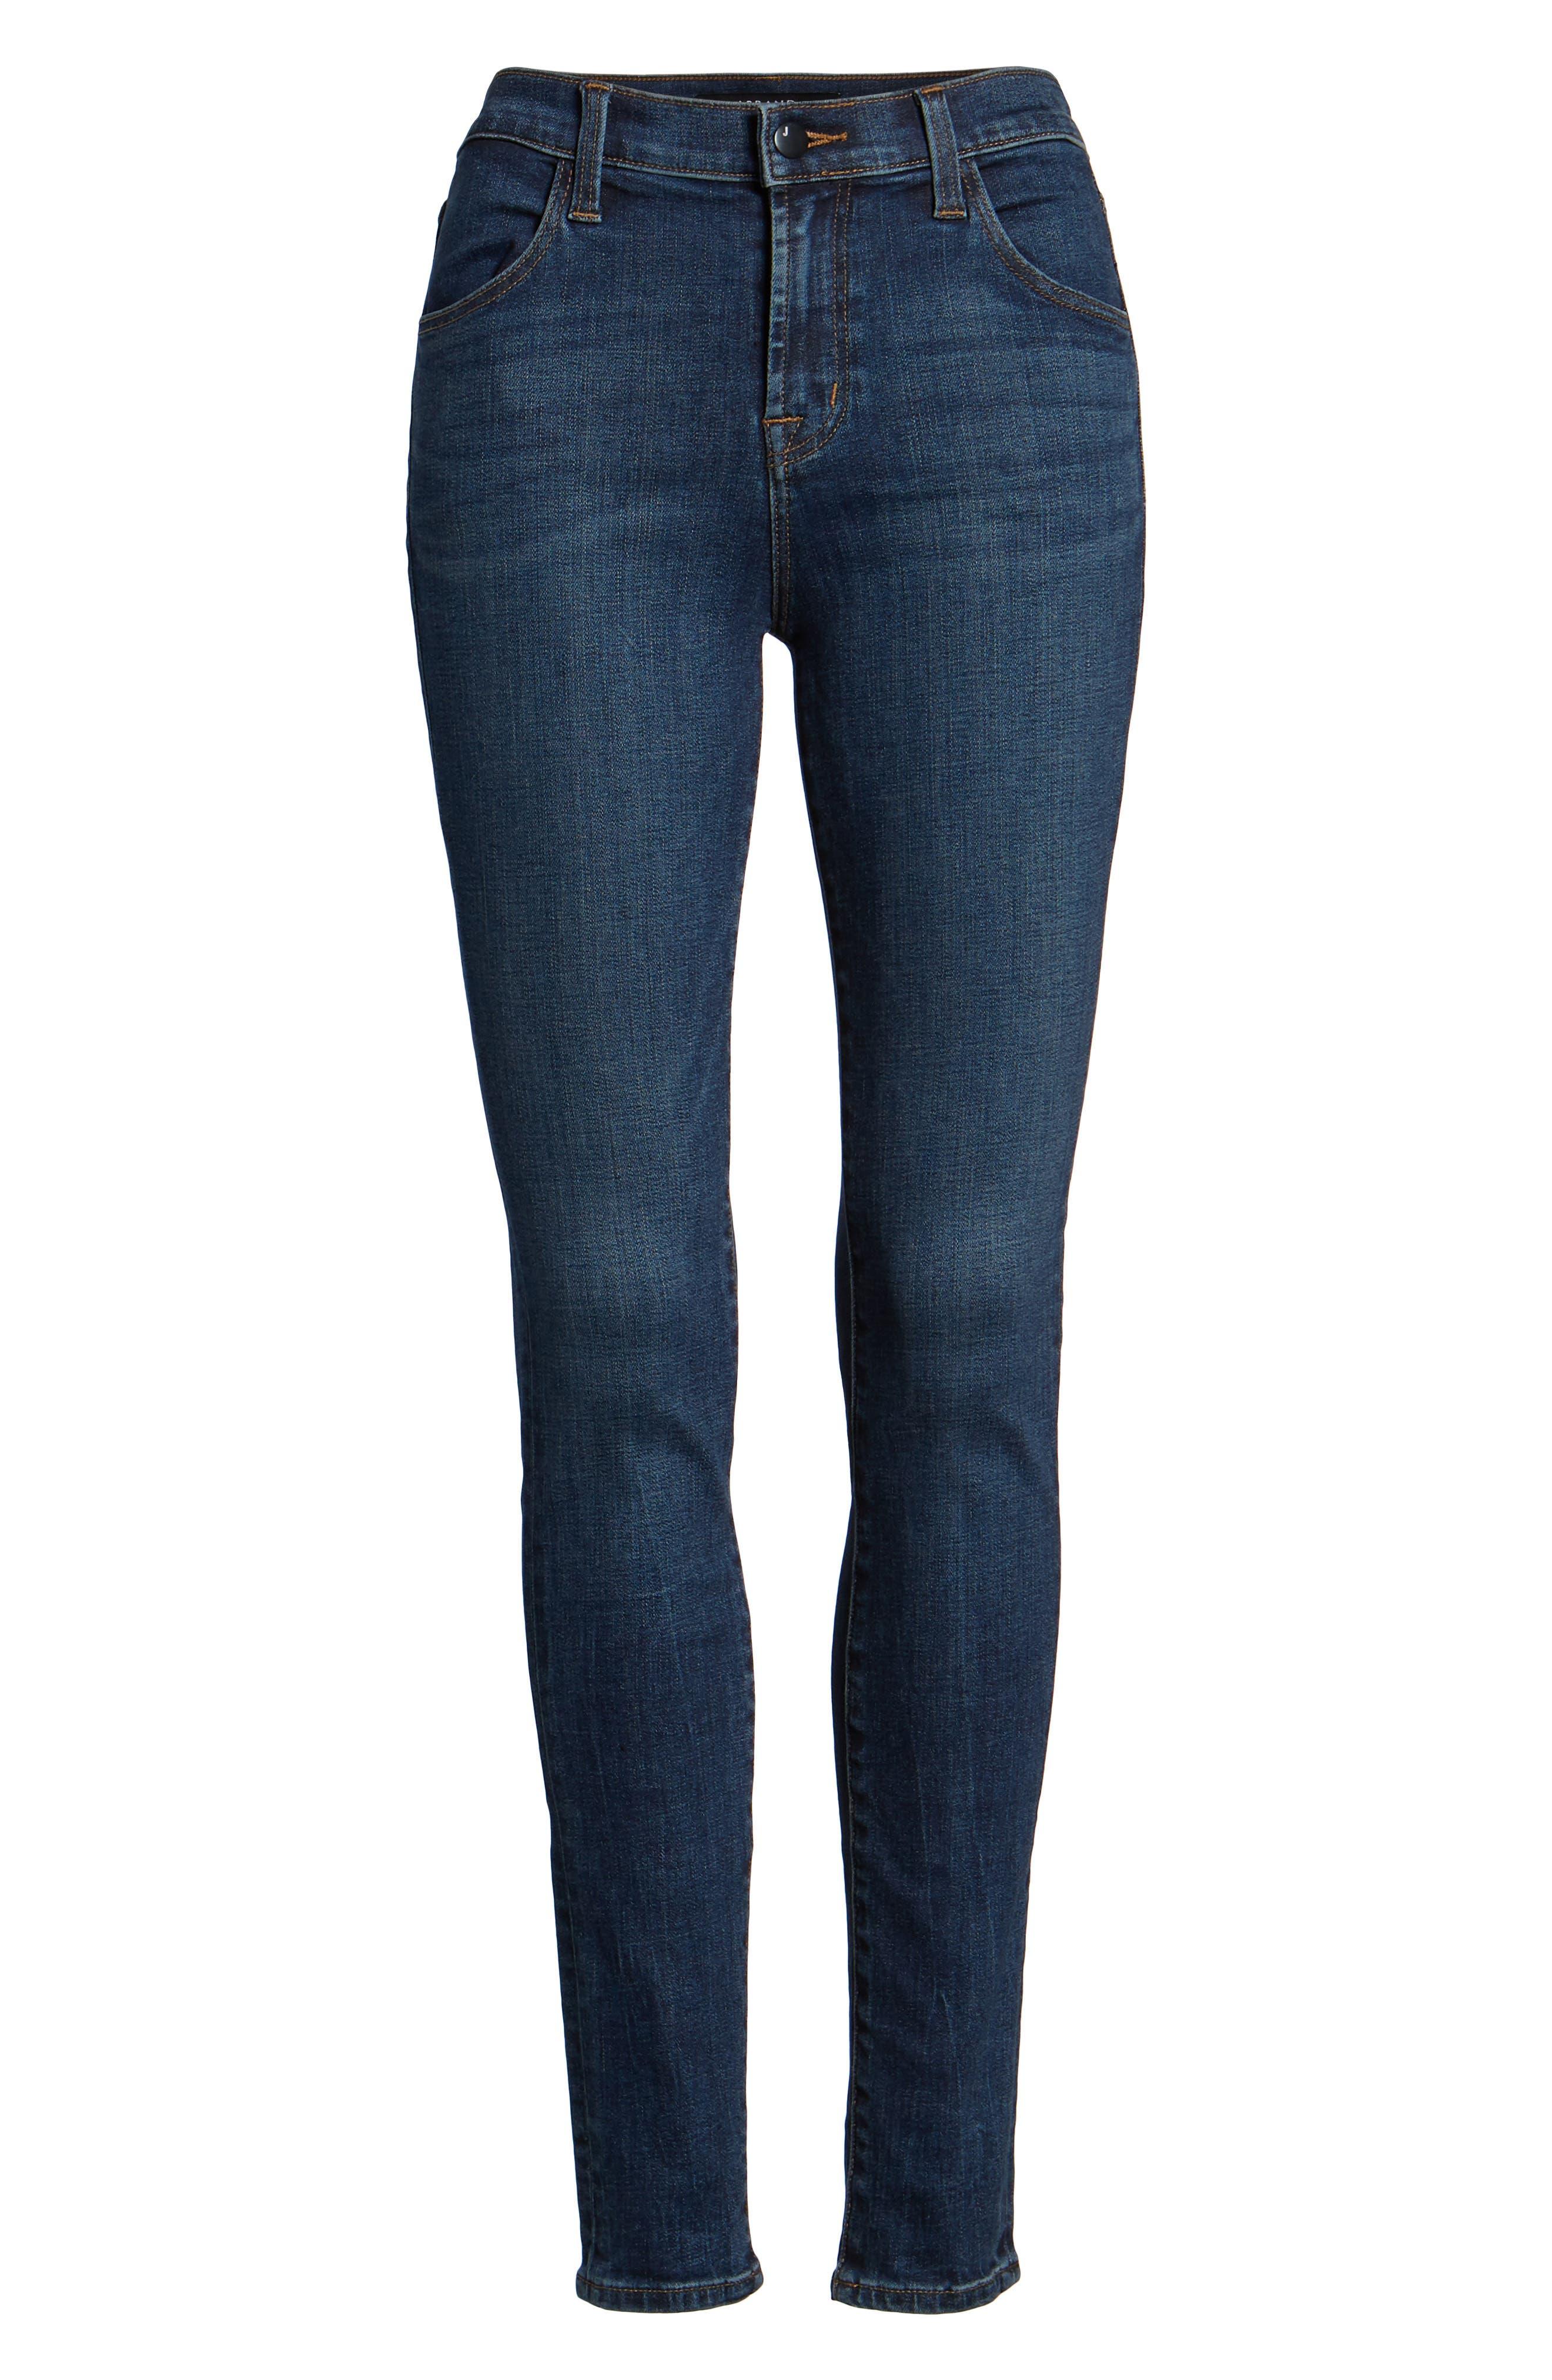 Maria High Waist Skinny Jeans,                             Alternate thumbnail 7, color,                             REVIVAL